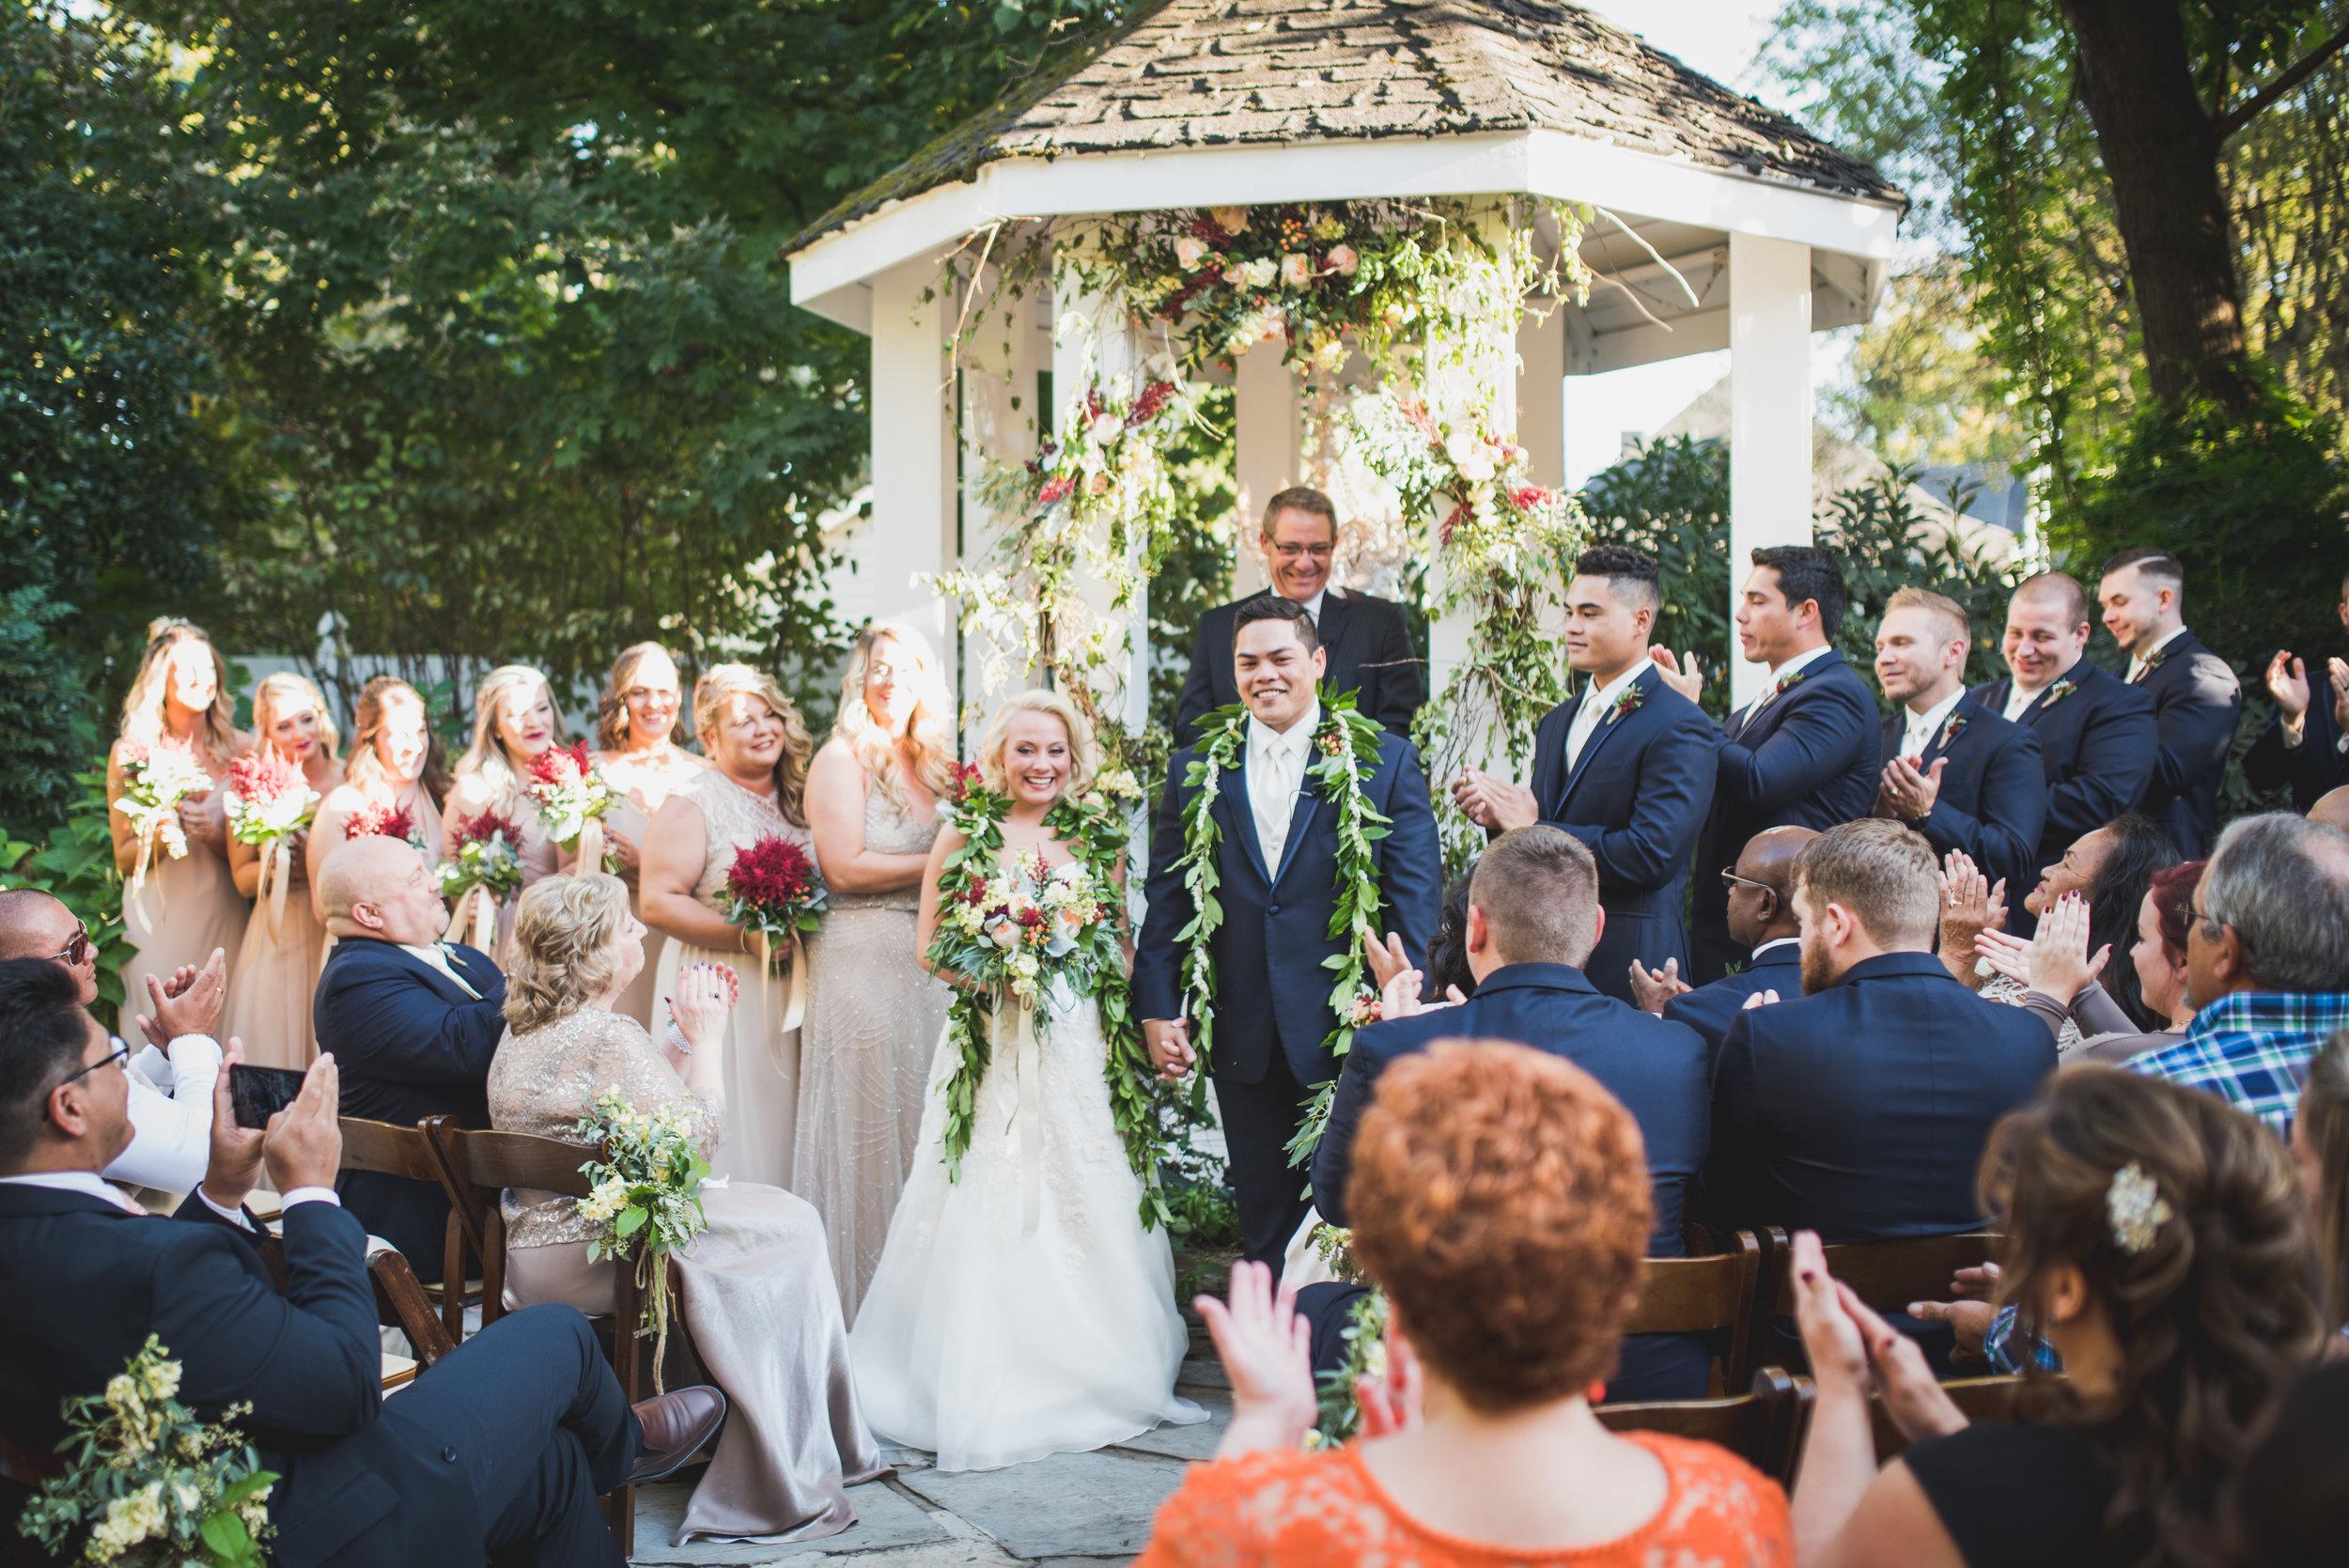 Nashville-wedding-photographers-CJ's-Off-The-Square-36.JPG